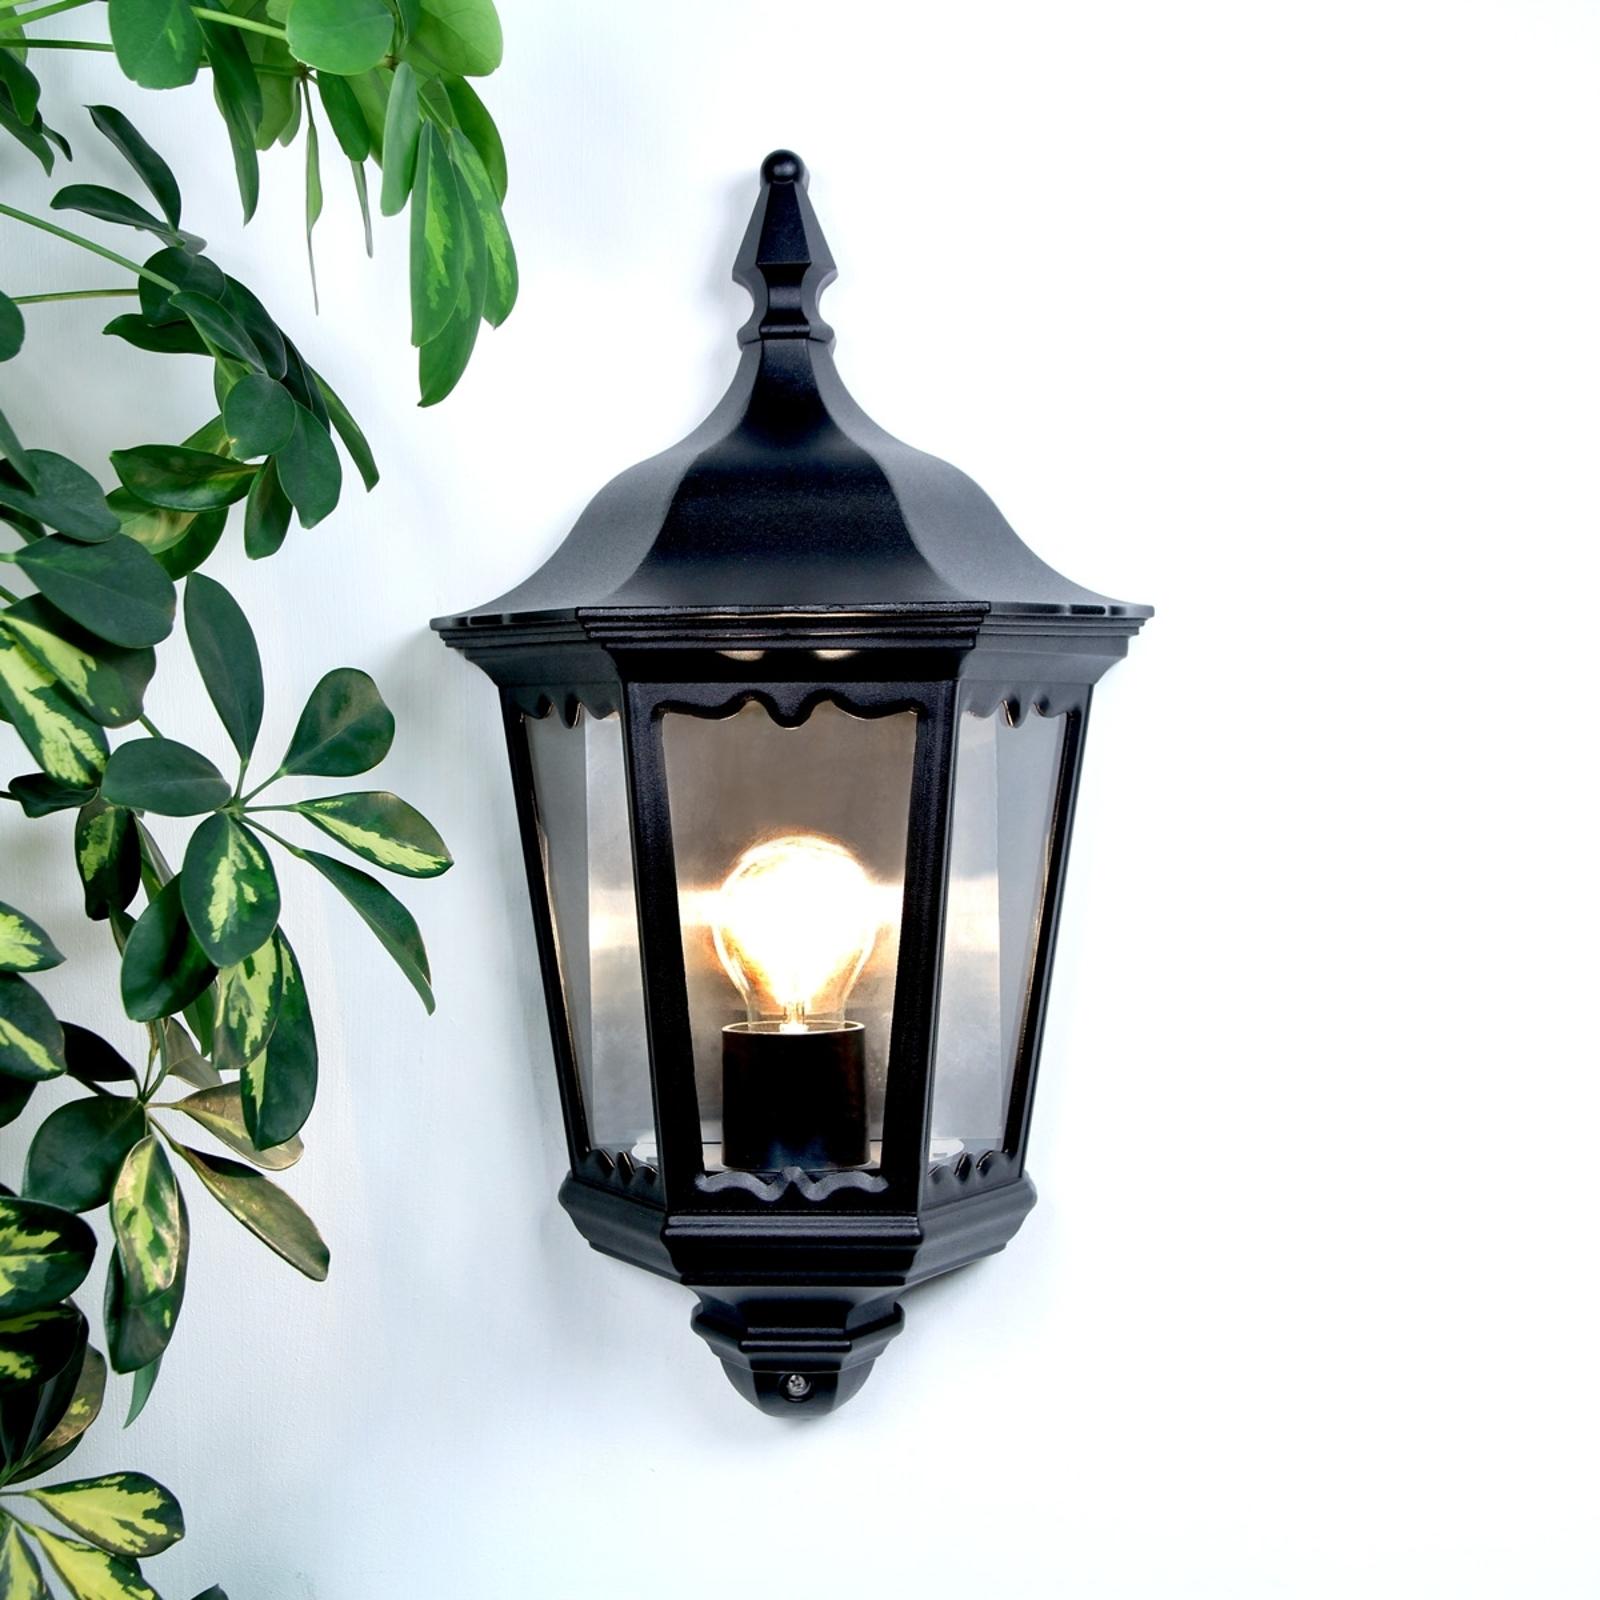 Buitenwandlamp Lieva, zwart